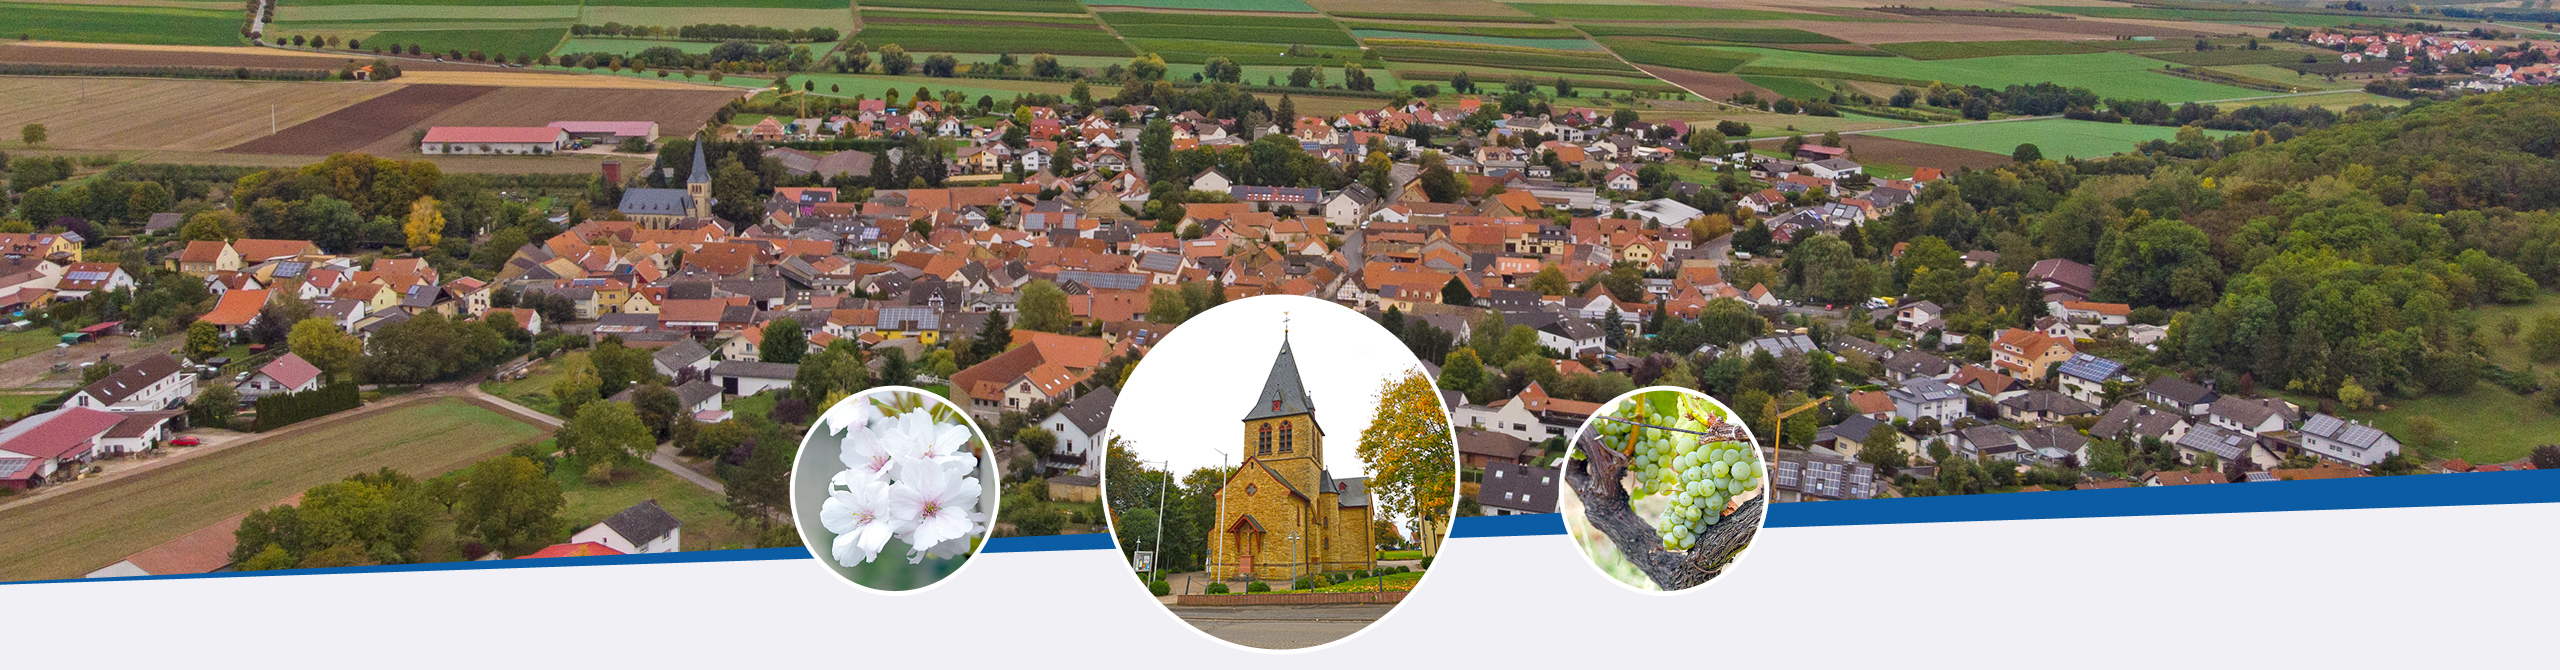 Ober-Hilbersheim